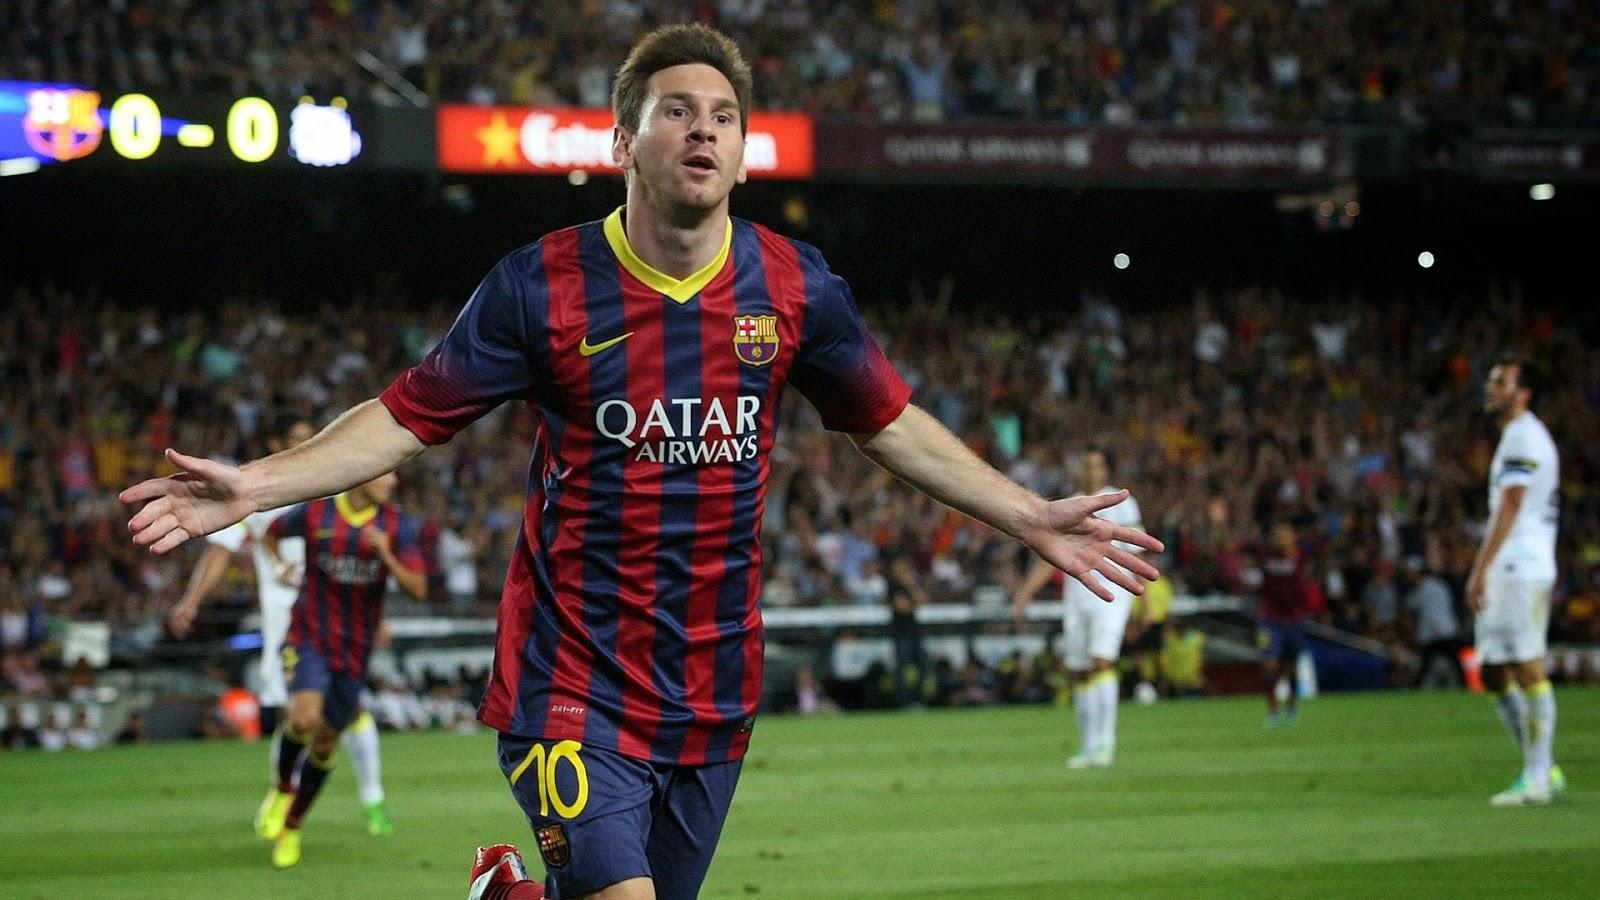 Fondo De Pantalla Linda Futbol: Lionel Messi: 20 Alucinantes Fondos De Pantalla Para Tu